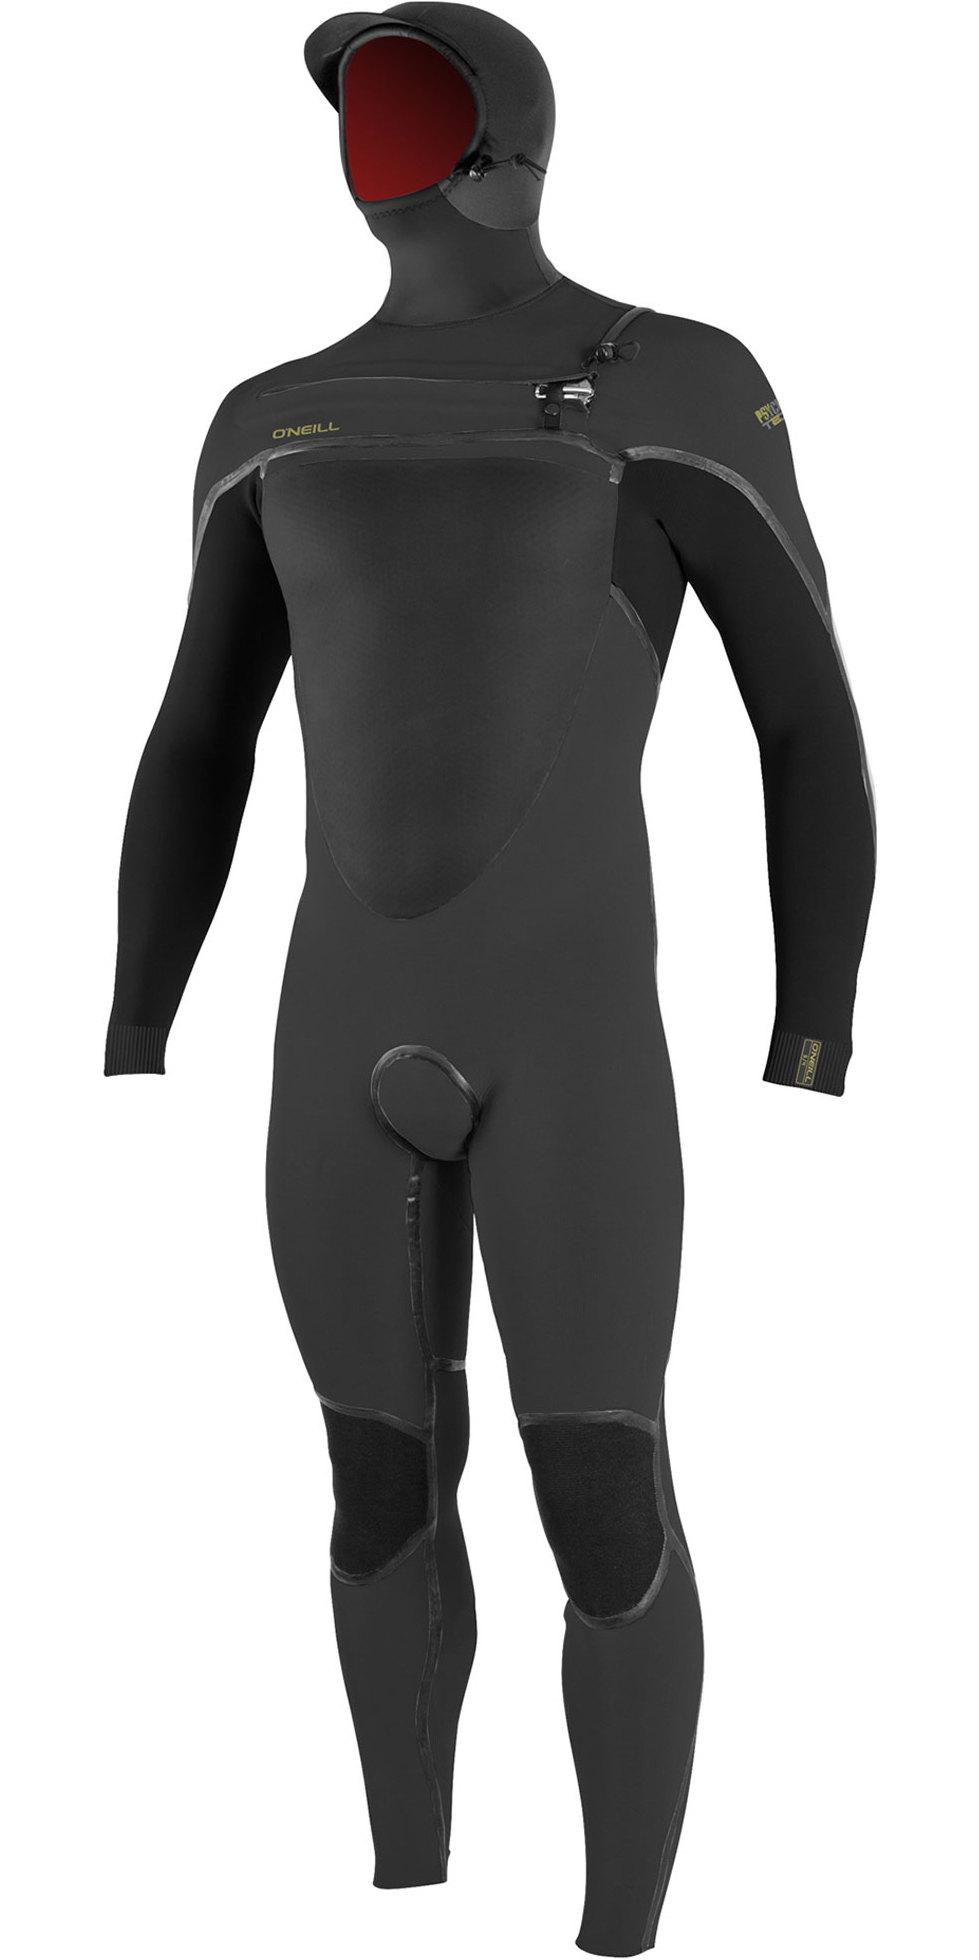 2019 O'Neill Psycho Tech 6/4mm Chest Zip Hooded Wetsuit Raven / Black 5366